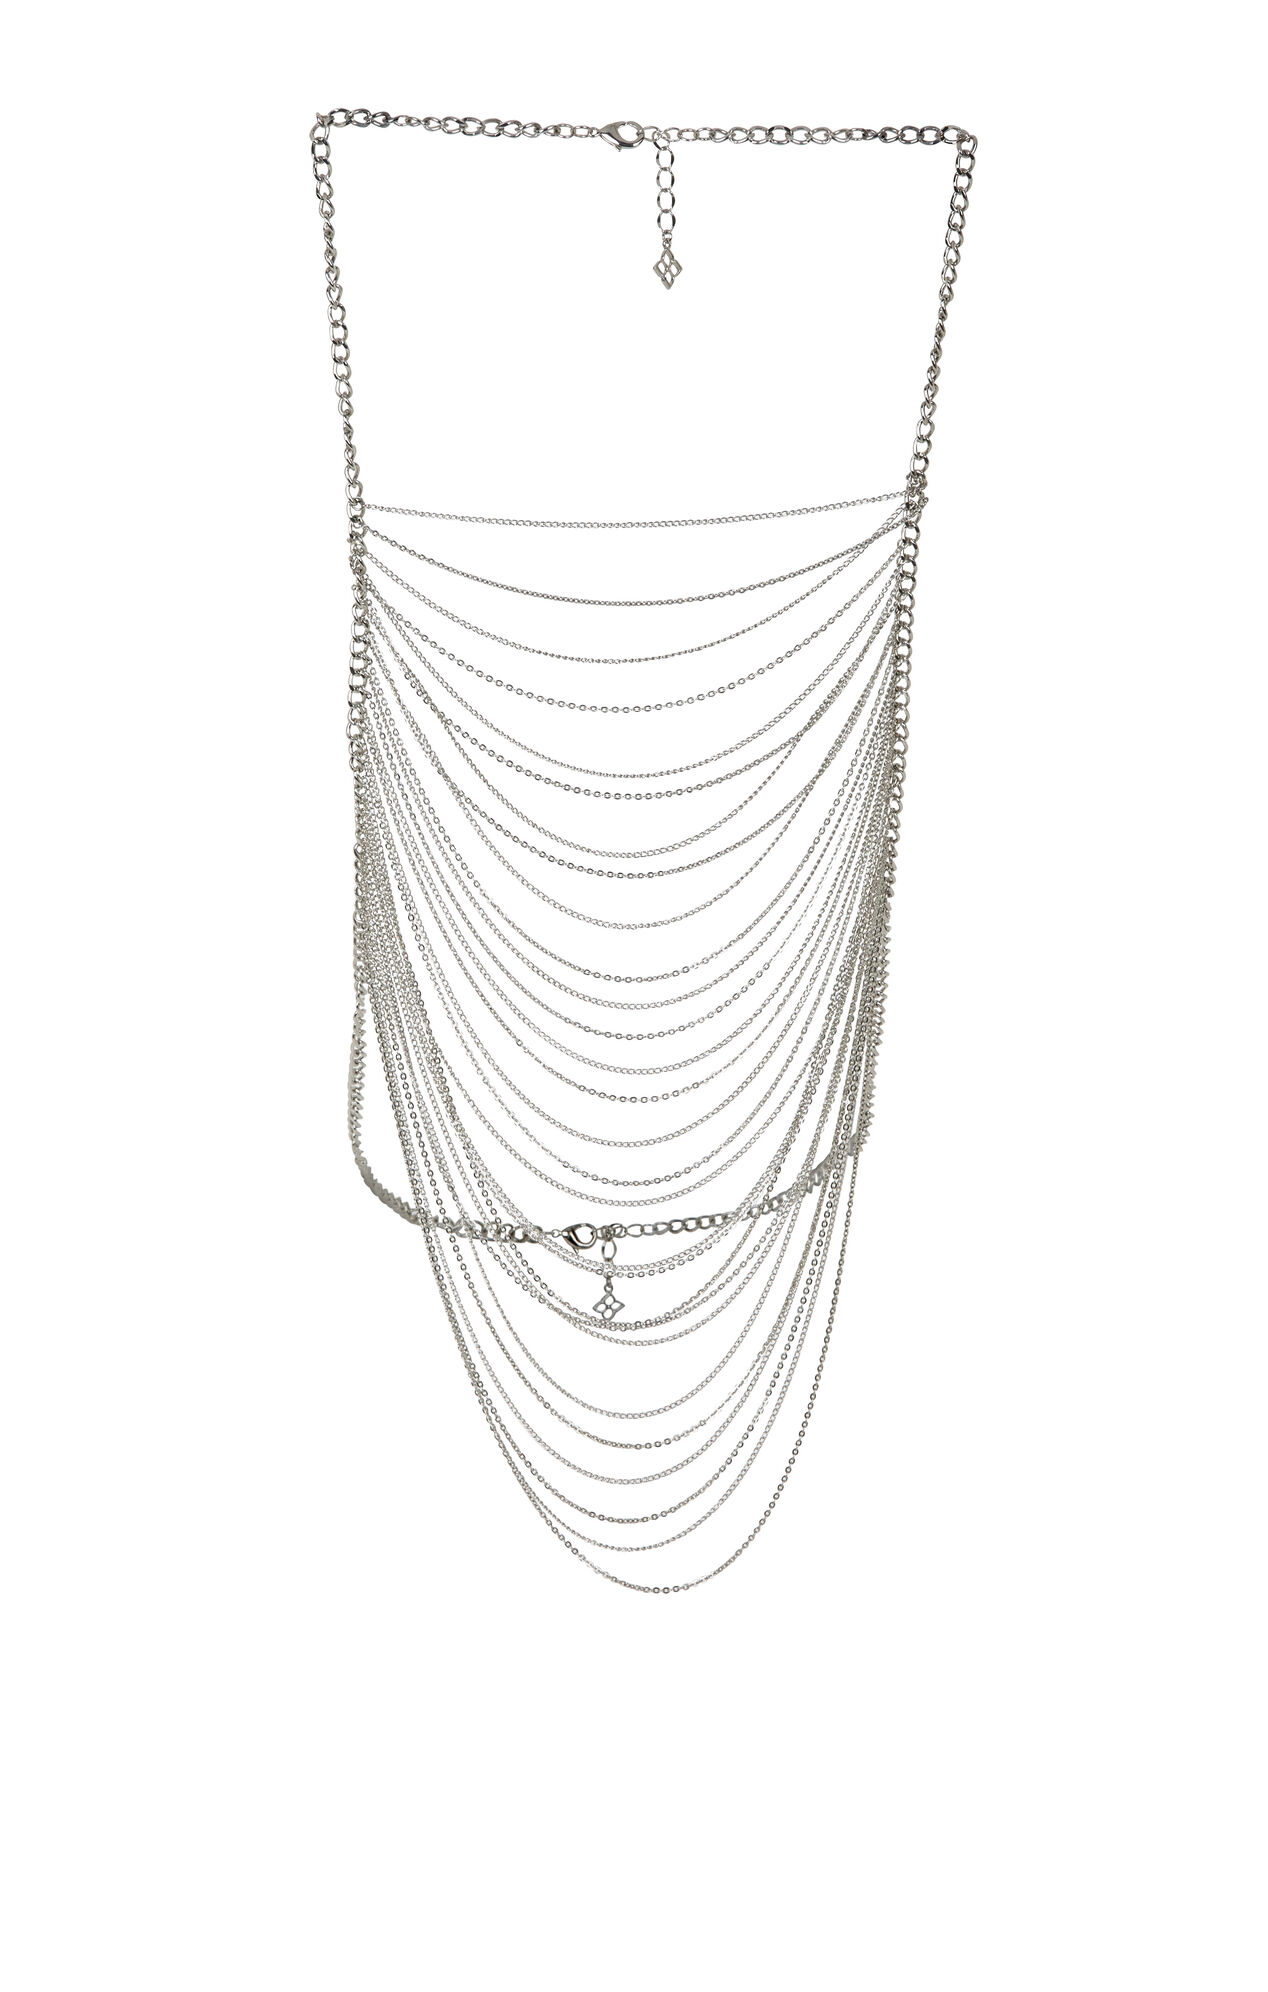 Draped Chain Body-Piece